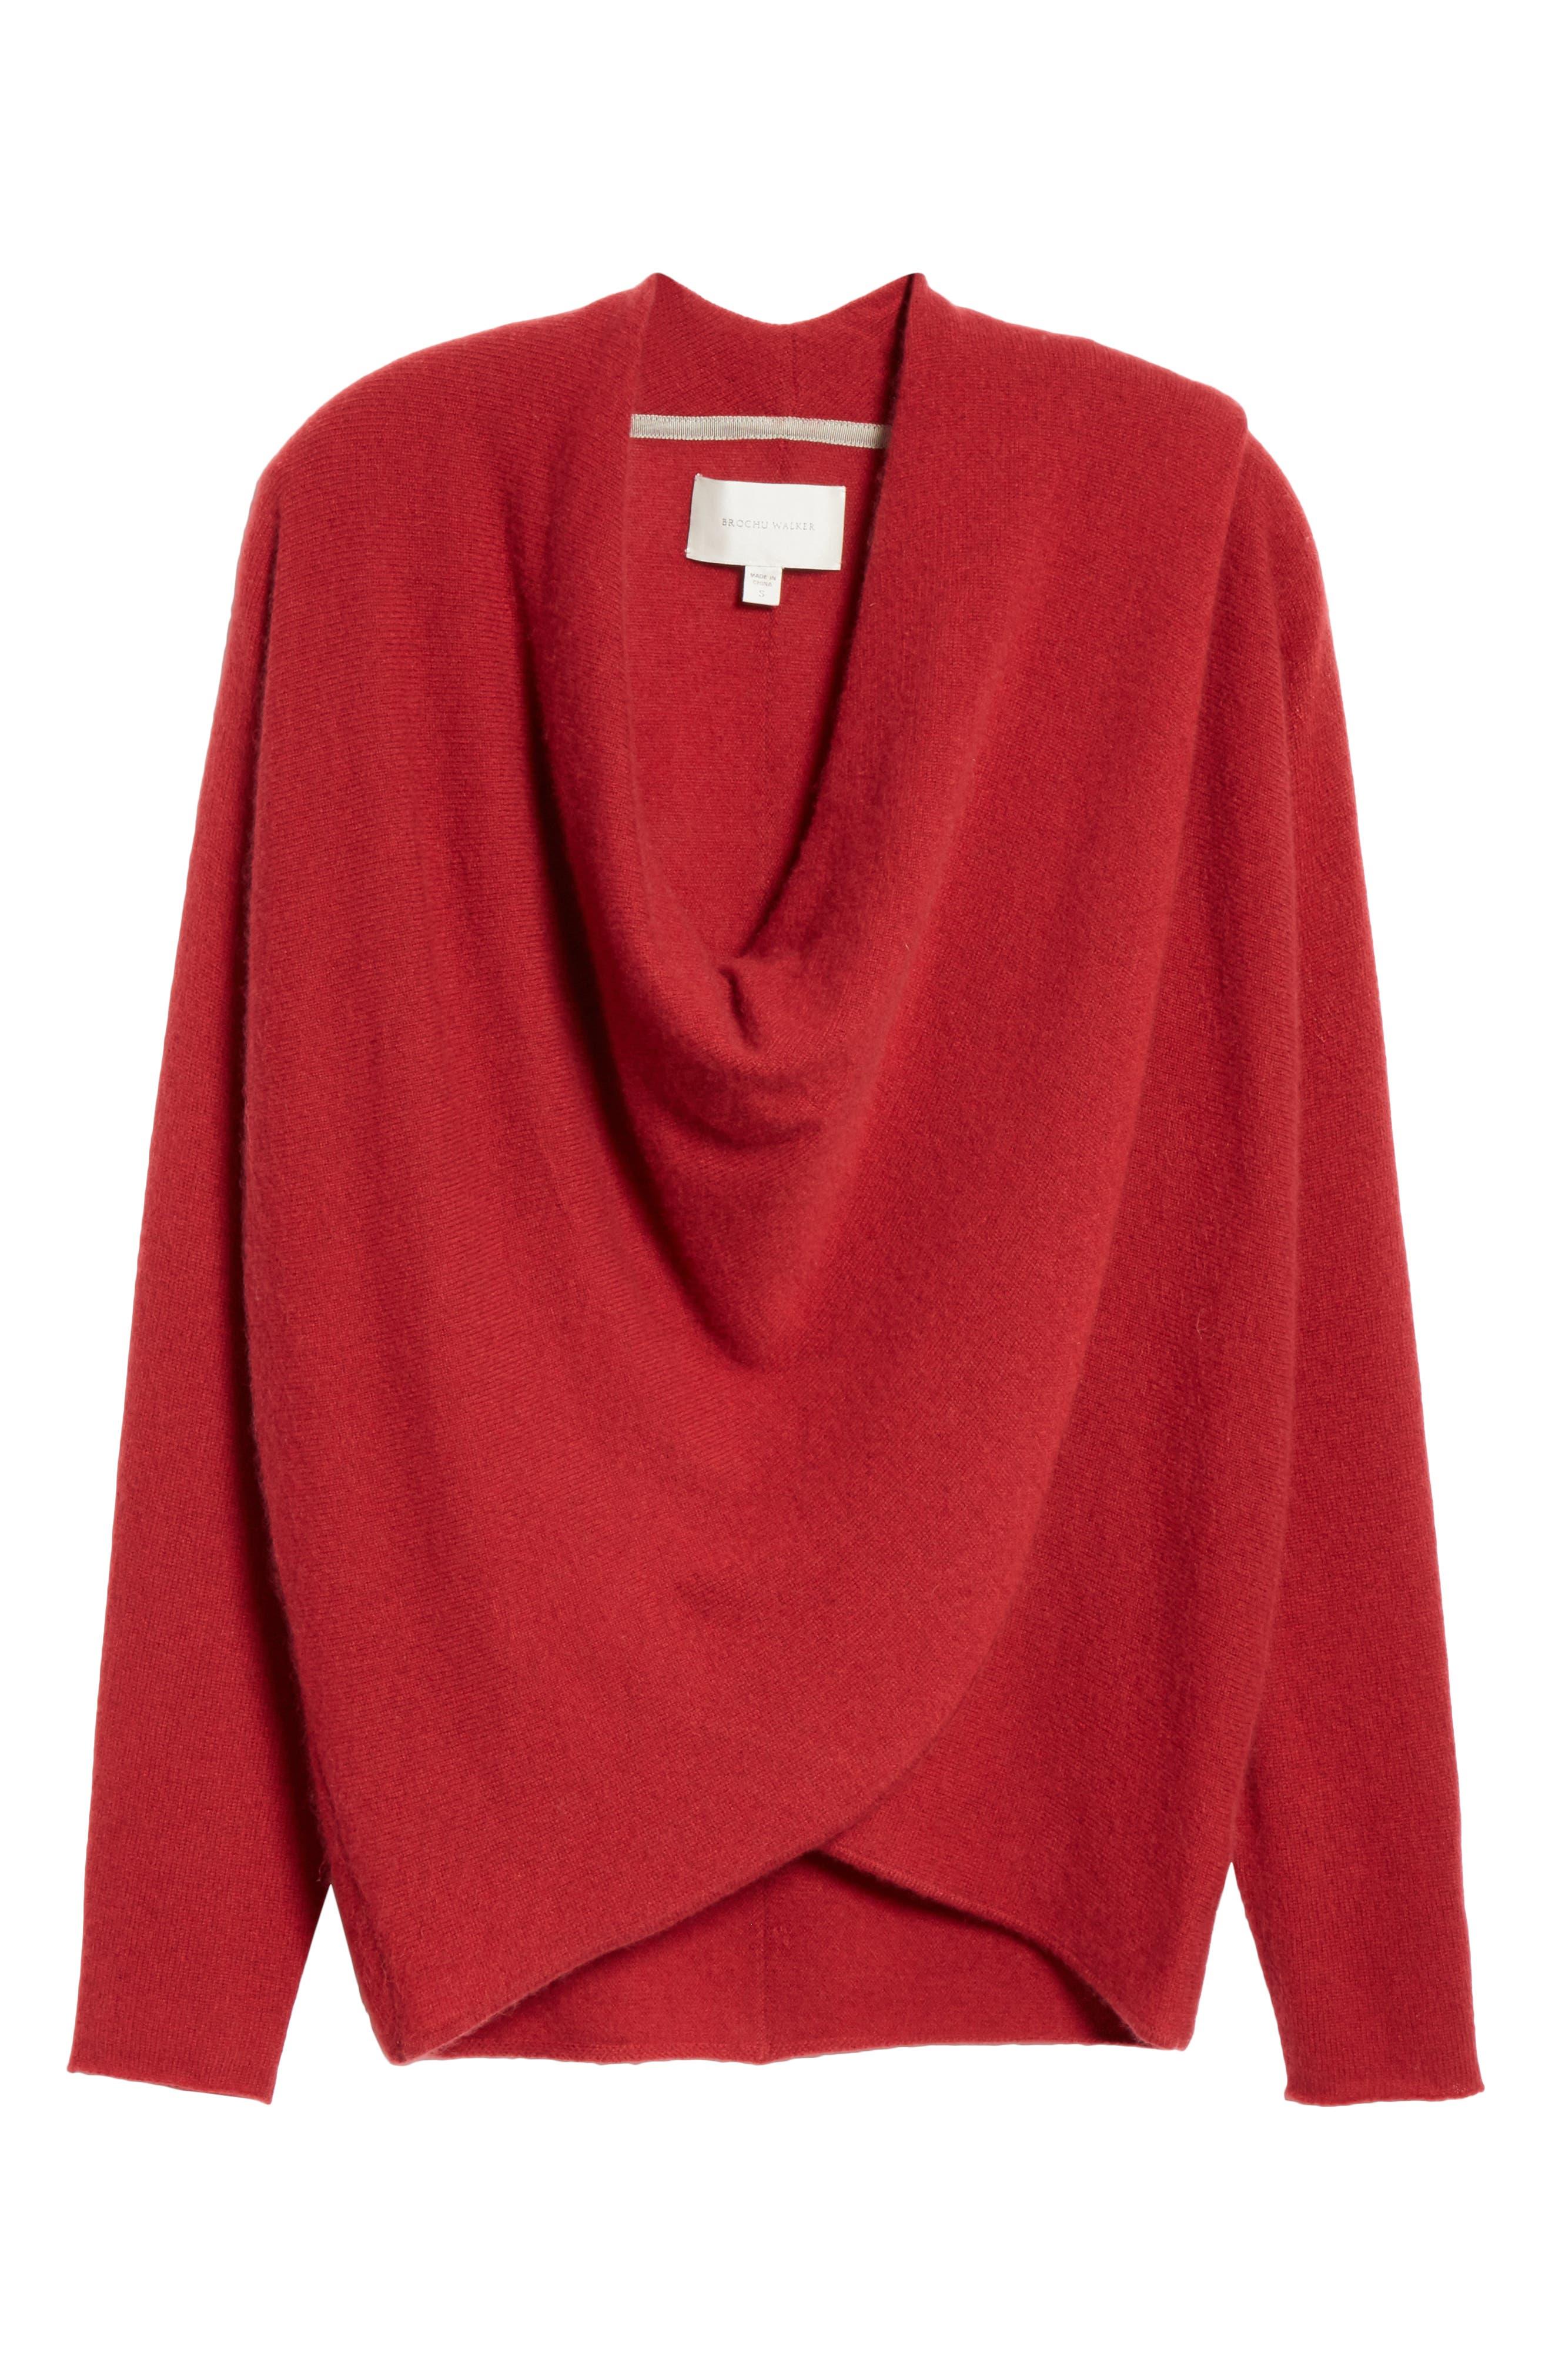 BROCHU WALKER,                             Clea Cashmere Wrap Sweater,                             Alternate thumbnail 6, color,                             TANGIER